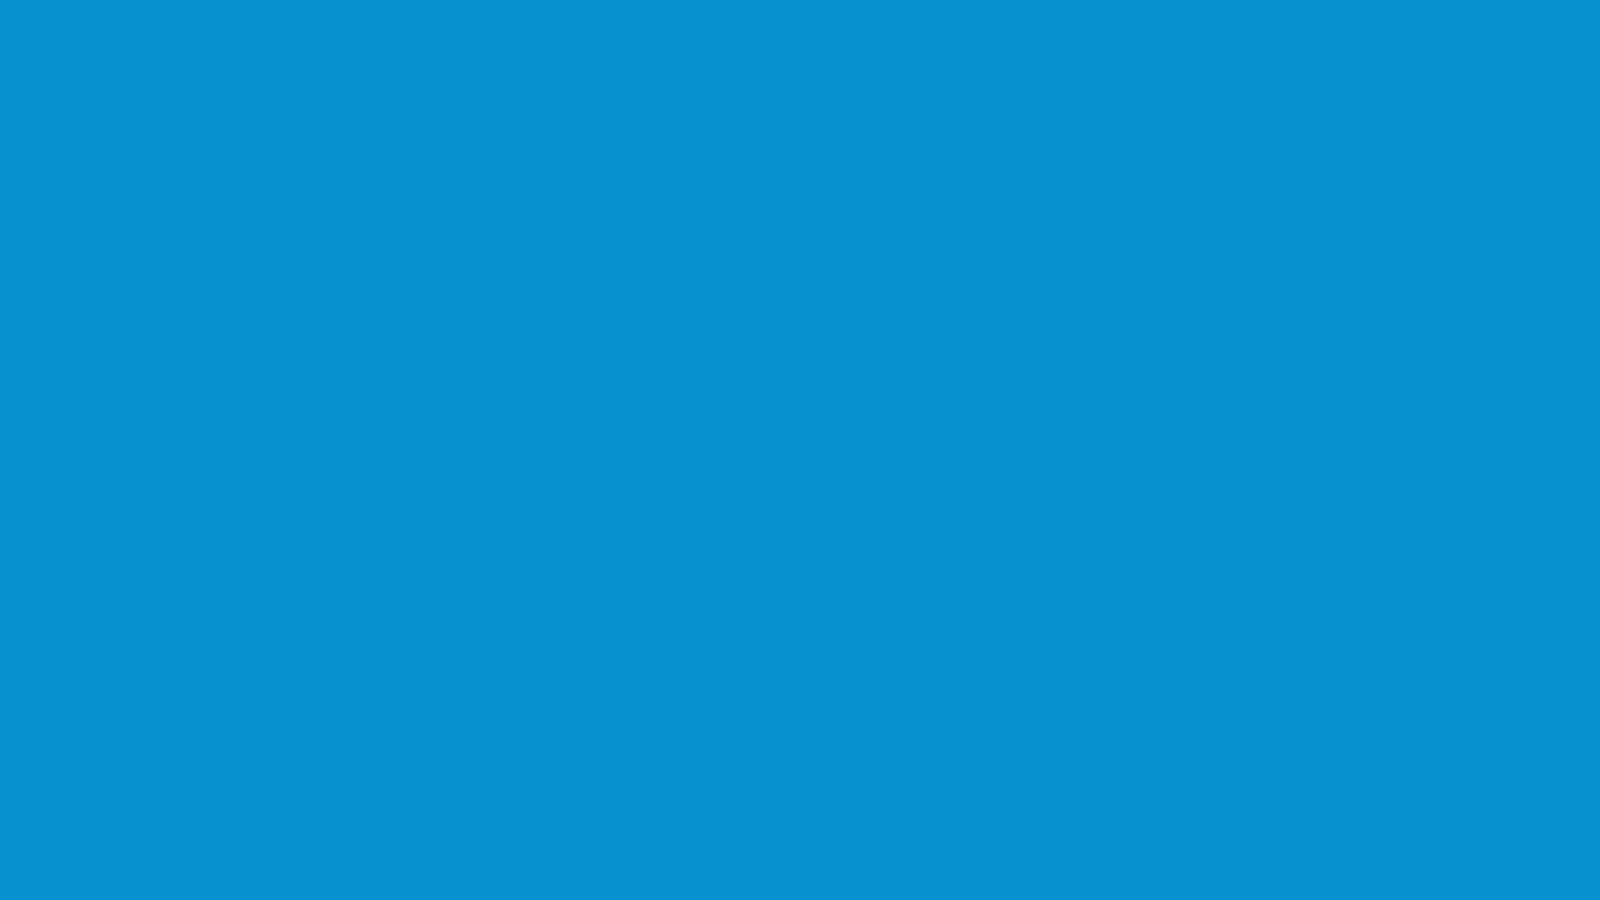 1600x900 rich electric blue solid color background. Black Bedroom Furniture Sets. Home Design Ideas